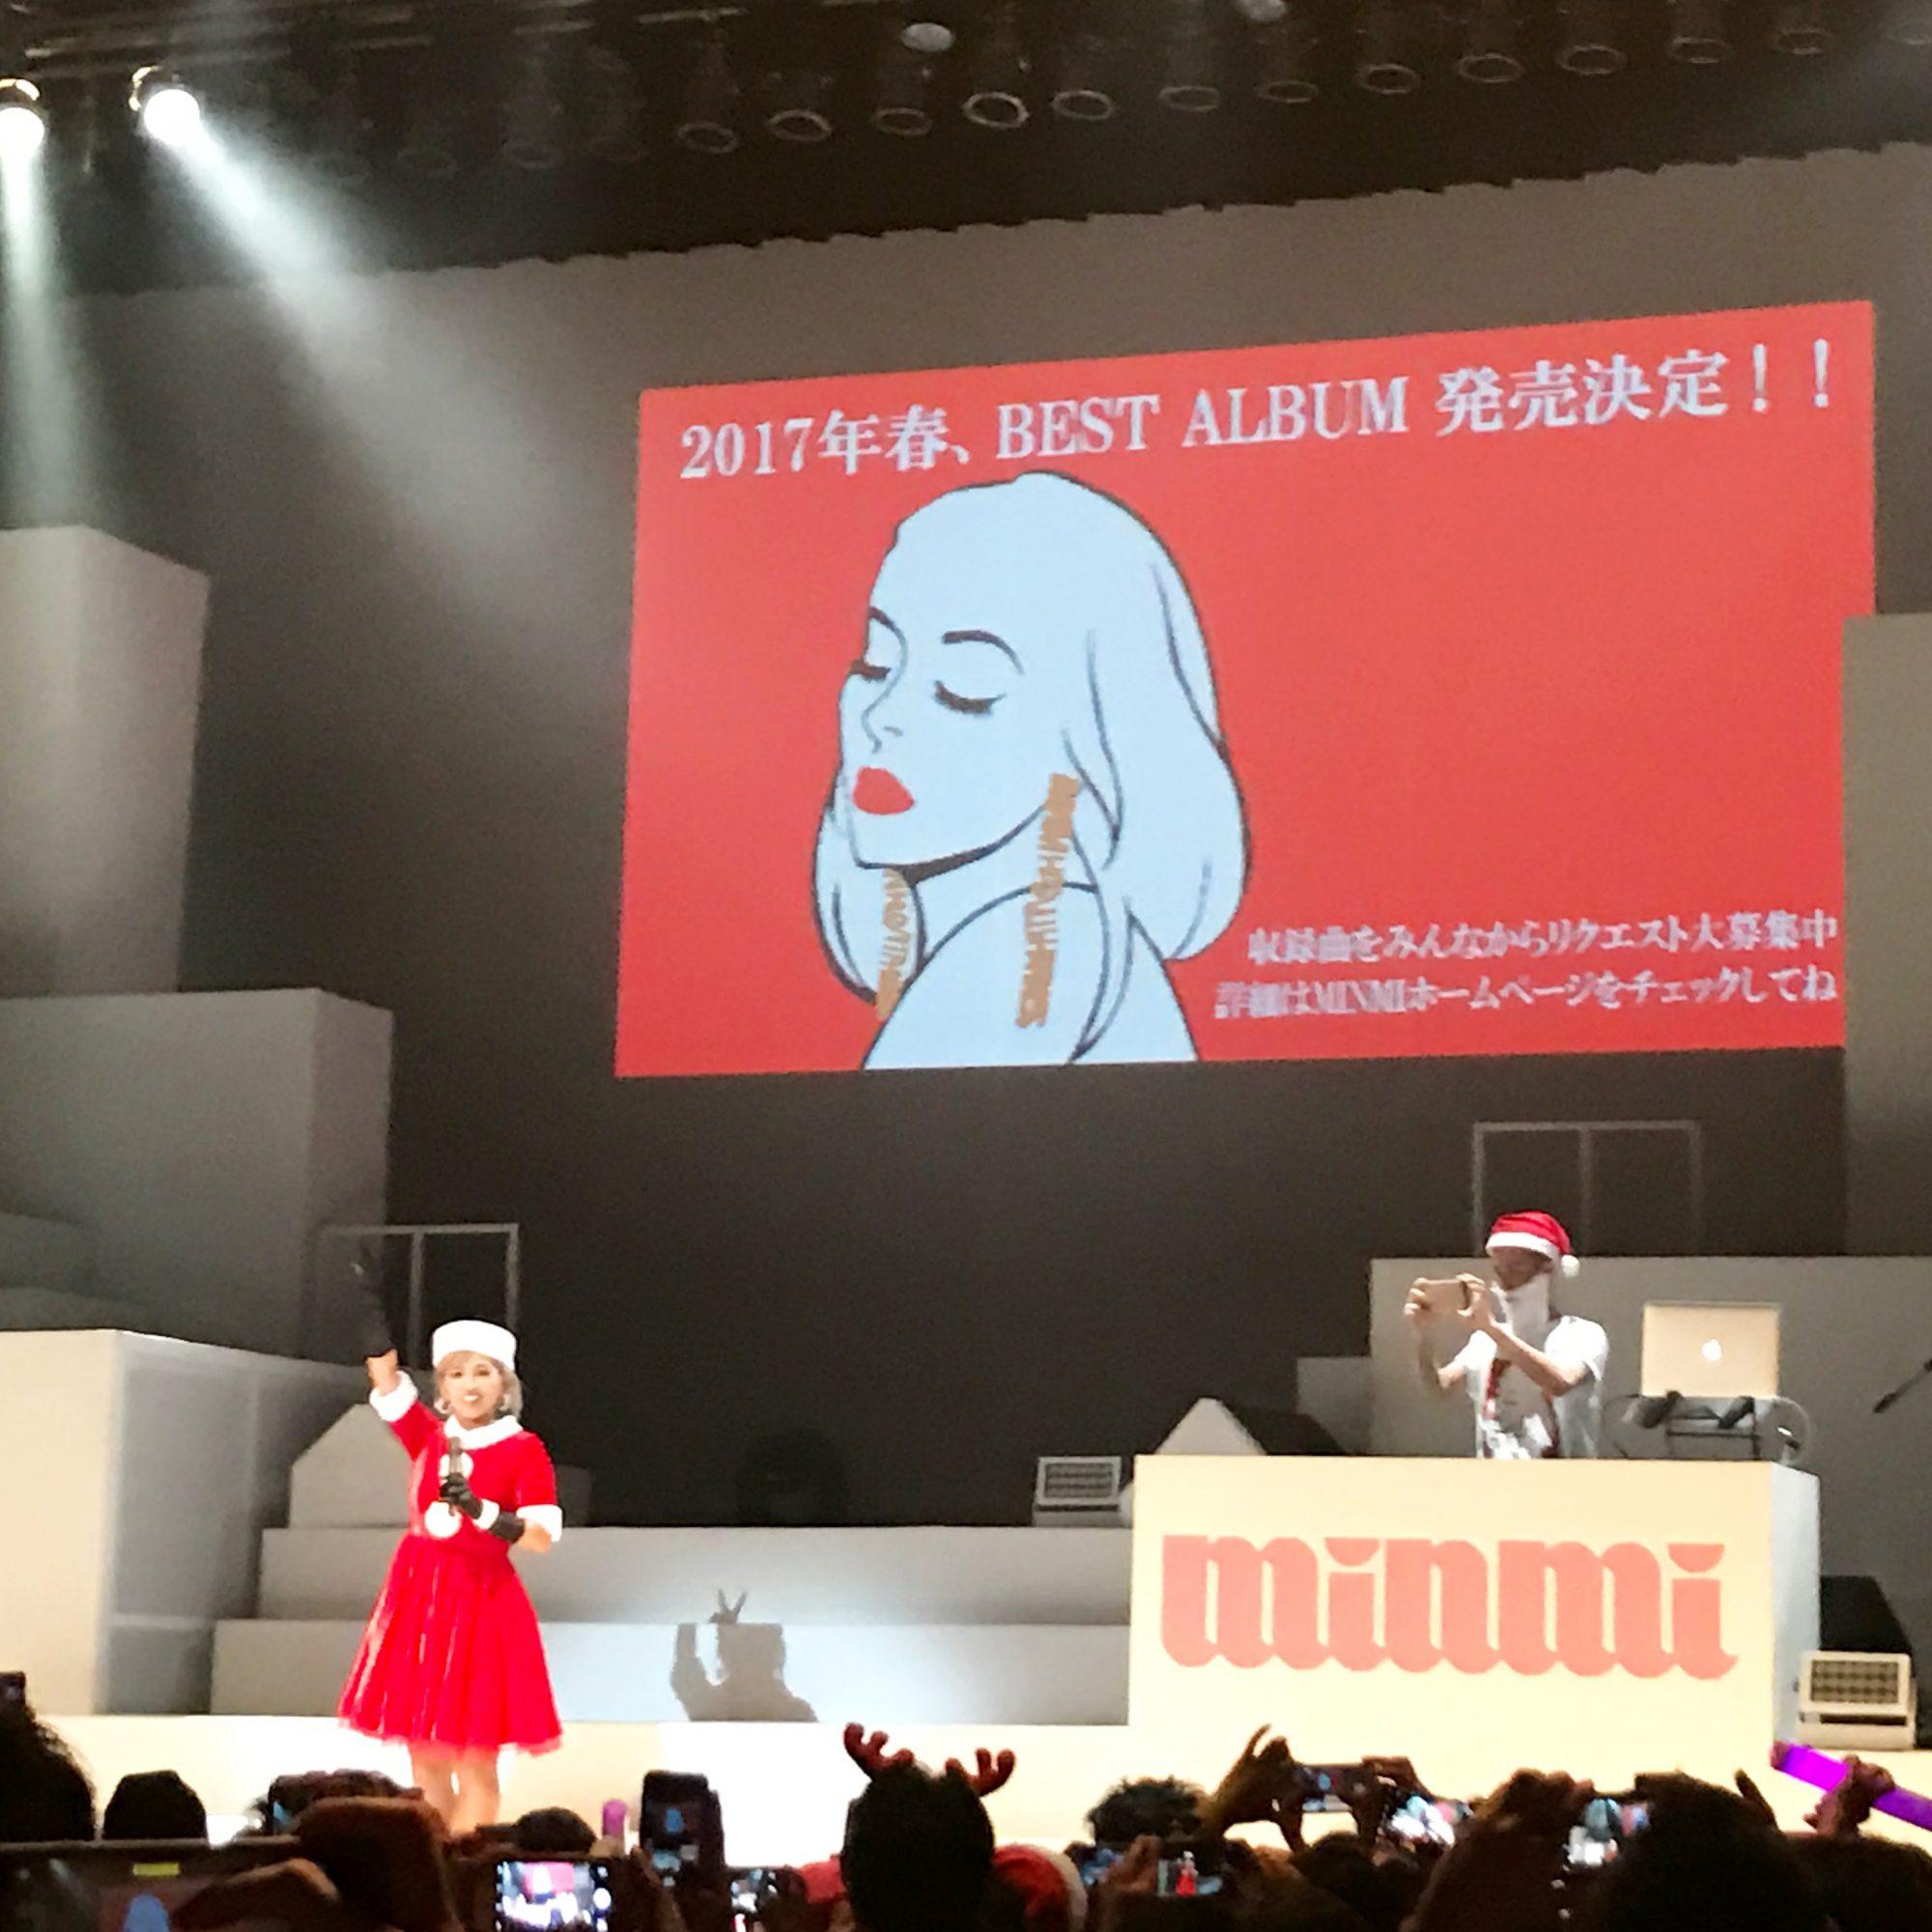 ♡Life is Beautiful♡【名古屋でMINMI様とクリスマスイヴ】